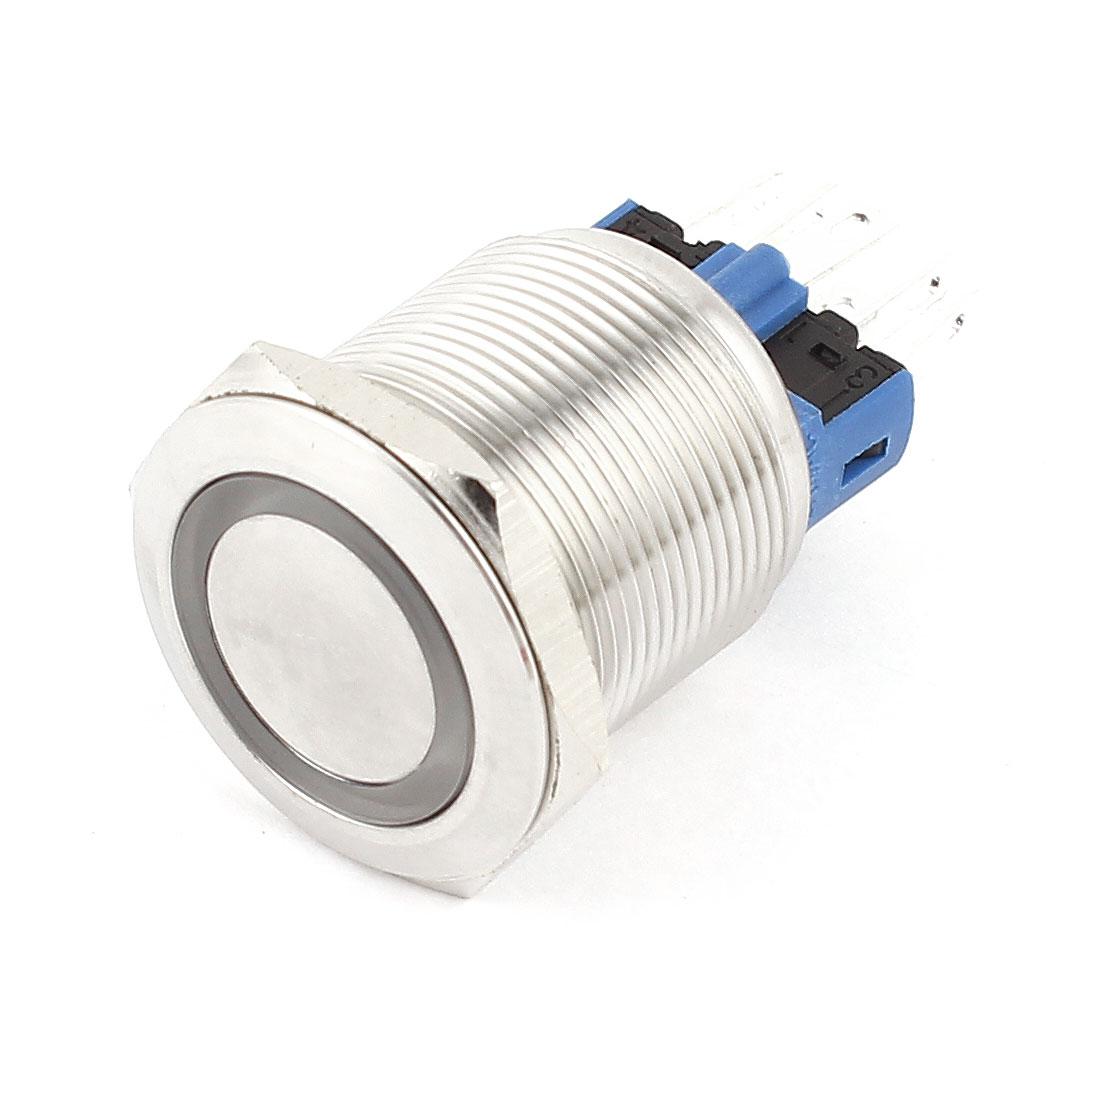 DC 12V Blue LED DPST 1NO 1NC 22mm Thread Self-Locking Push Button Switch